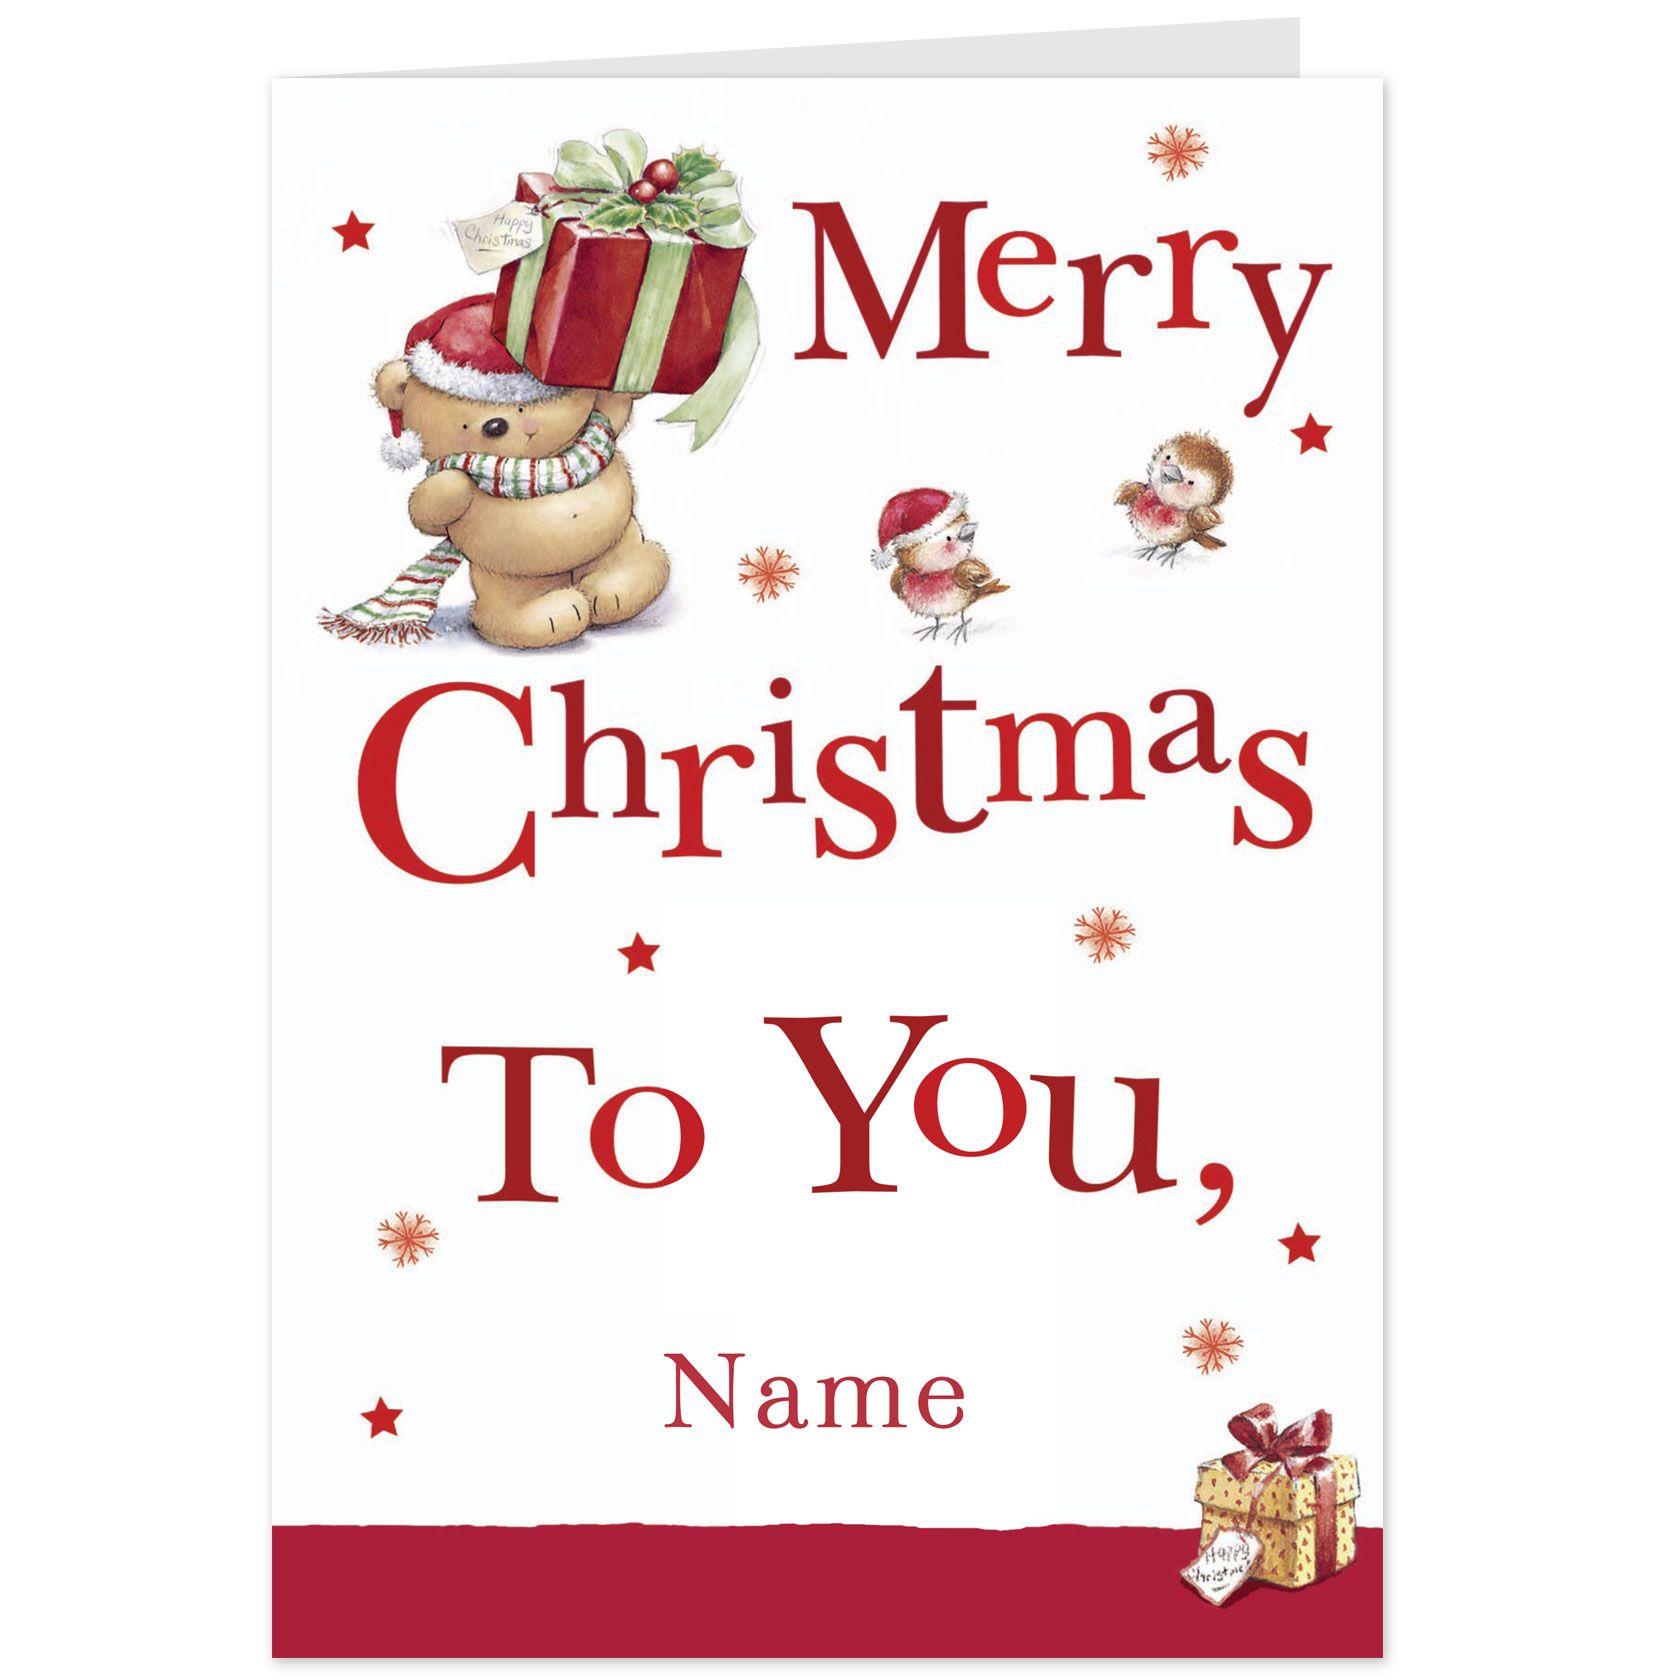 Christmas Cards, Merry Christmas To You, Hallmark Cards